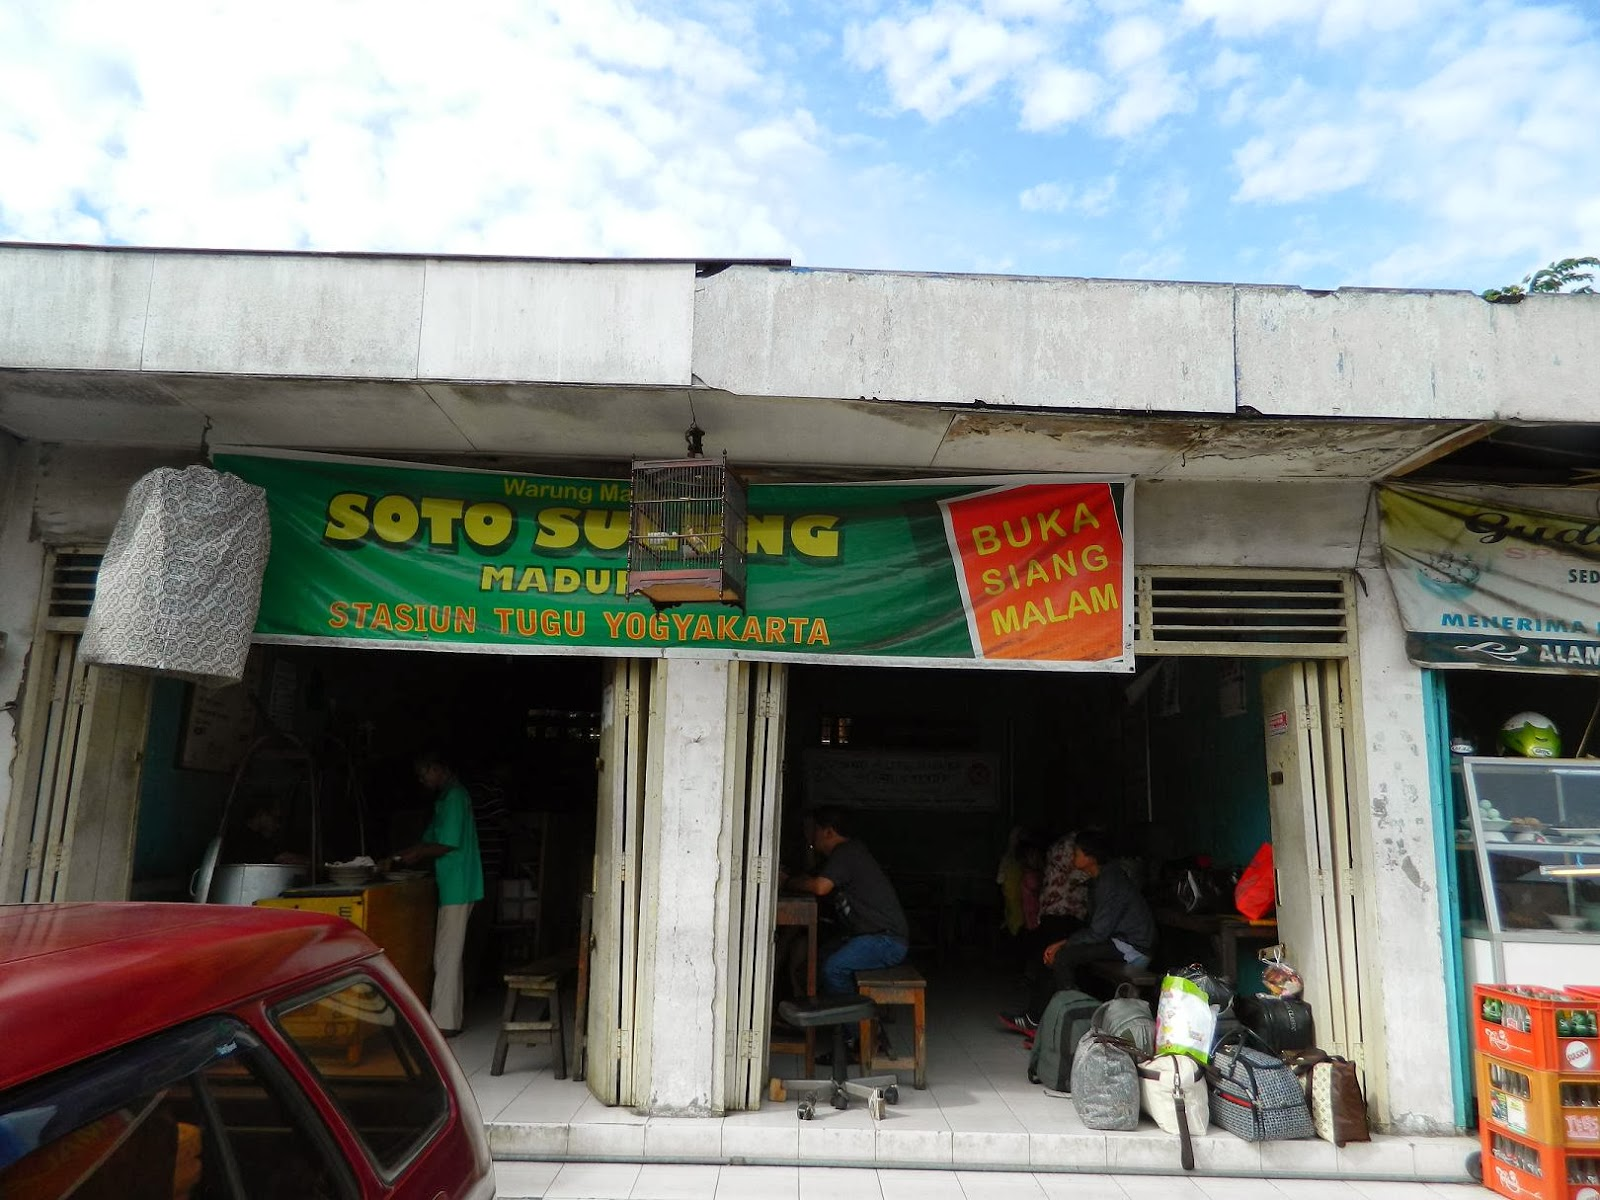 tempat makan soto sulung stasiun tugu yogyakarta